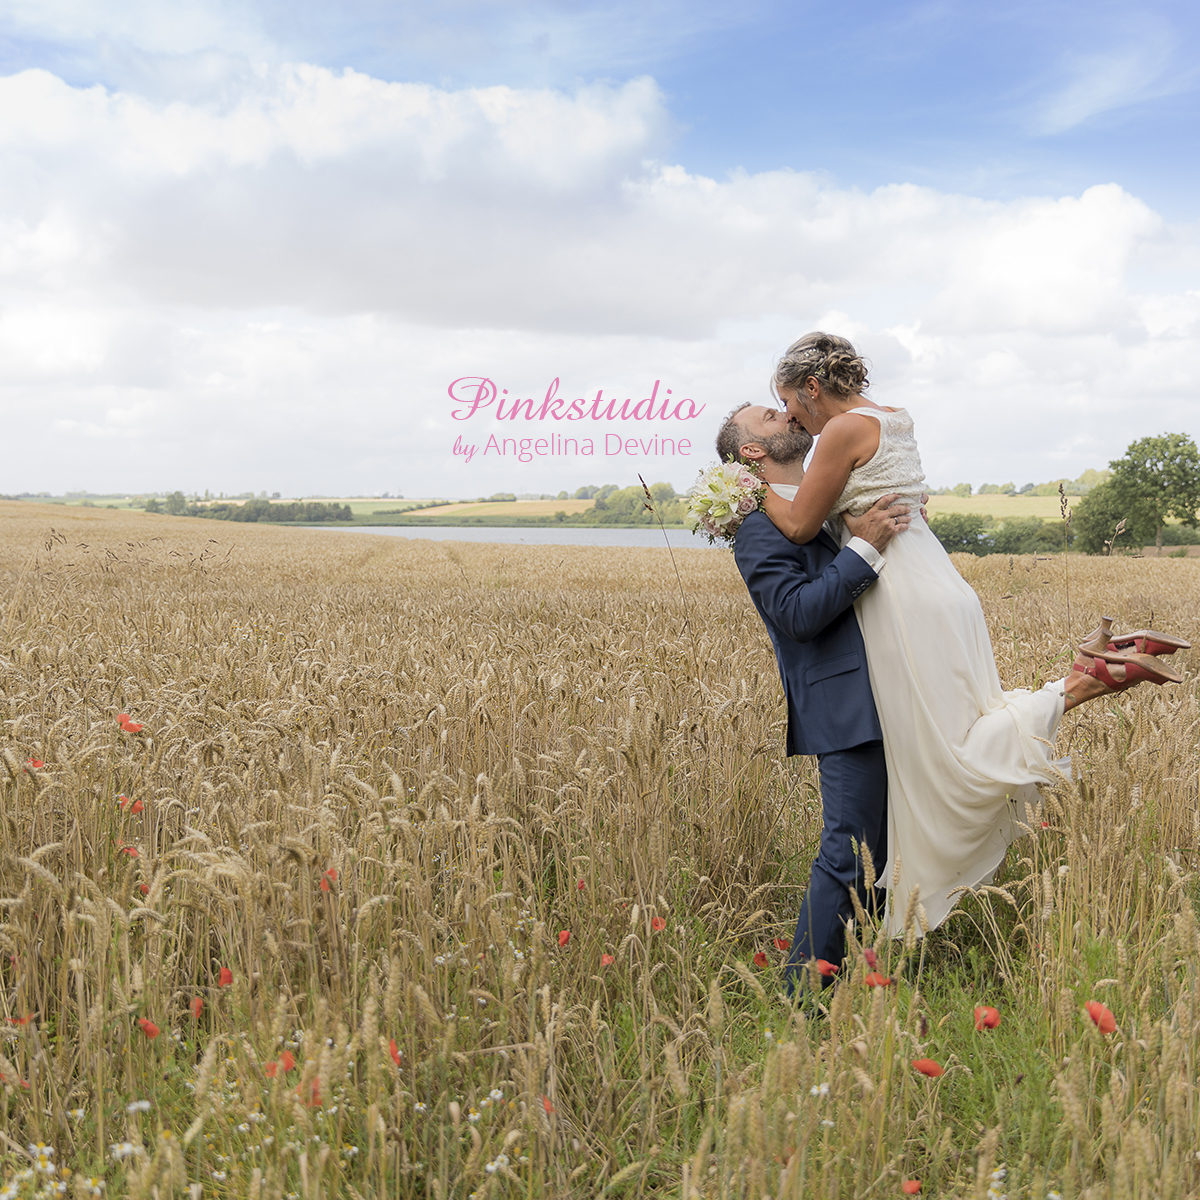 Pinkstudio-by-Angelina-Devine-bryllupsportræt